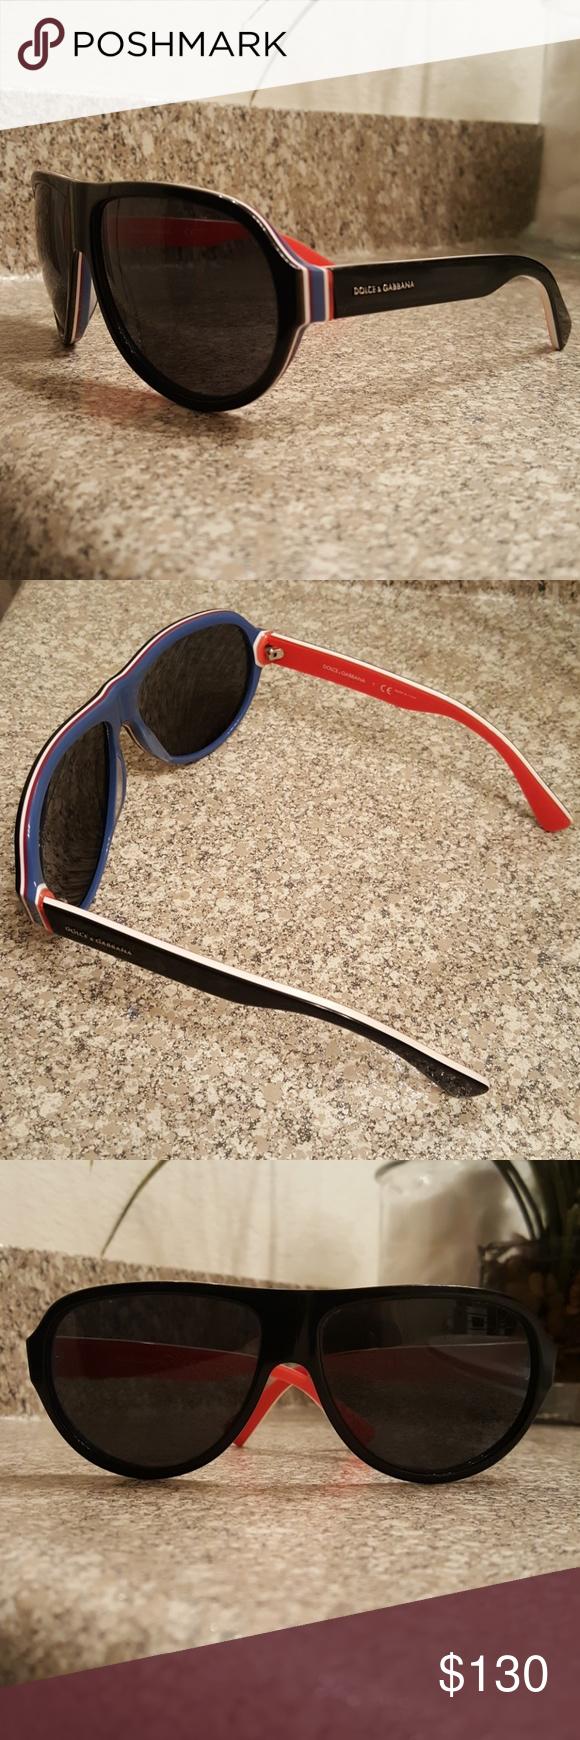 6648ea286e00 Dolce & Gabbana sunglasses DOLCE & GABBANA men's or women's Sunglasses  Model DG4204 2764/87 Black 64mm Frames. The Limited Edition DOL… | My Posh  Picks